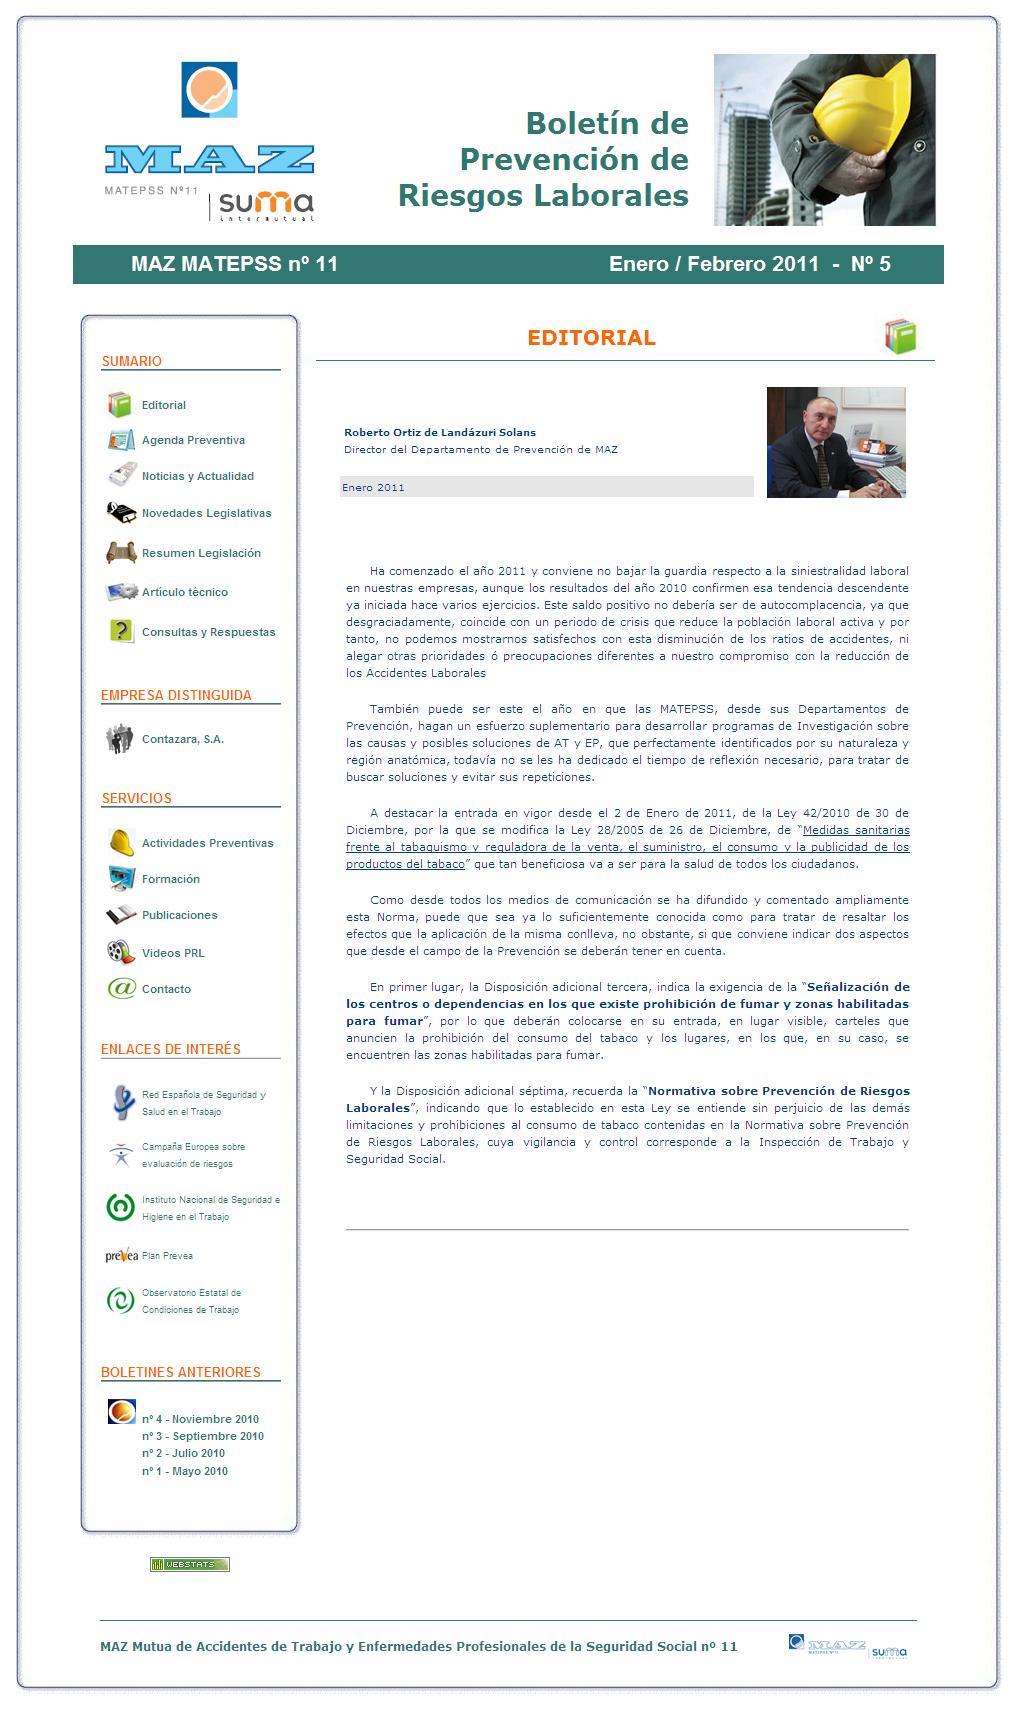 Boletín PRL - Nº 05 - Enero 2011